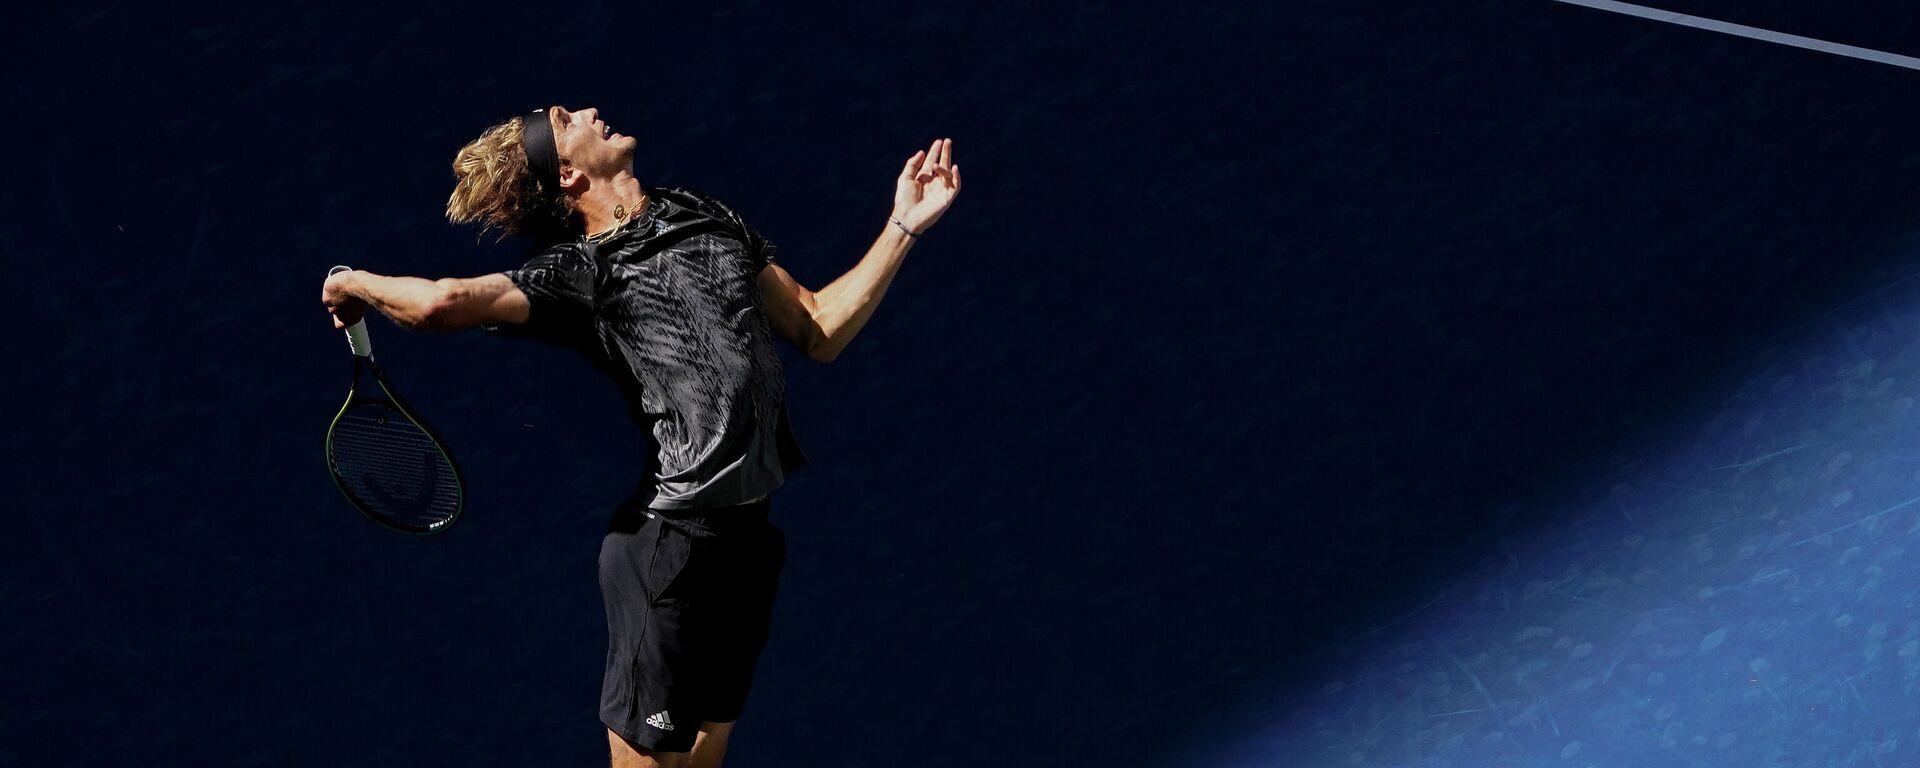 Nemački teniser Aleksander Zverev na US openu 2021. - Sputnik Srbija, 1920, 02.09.2021